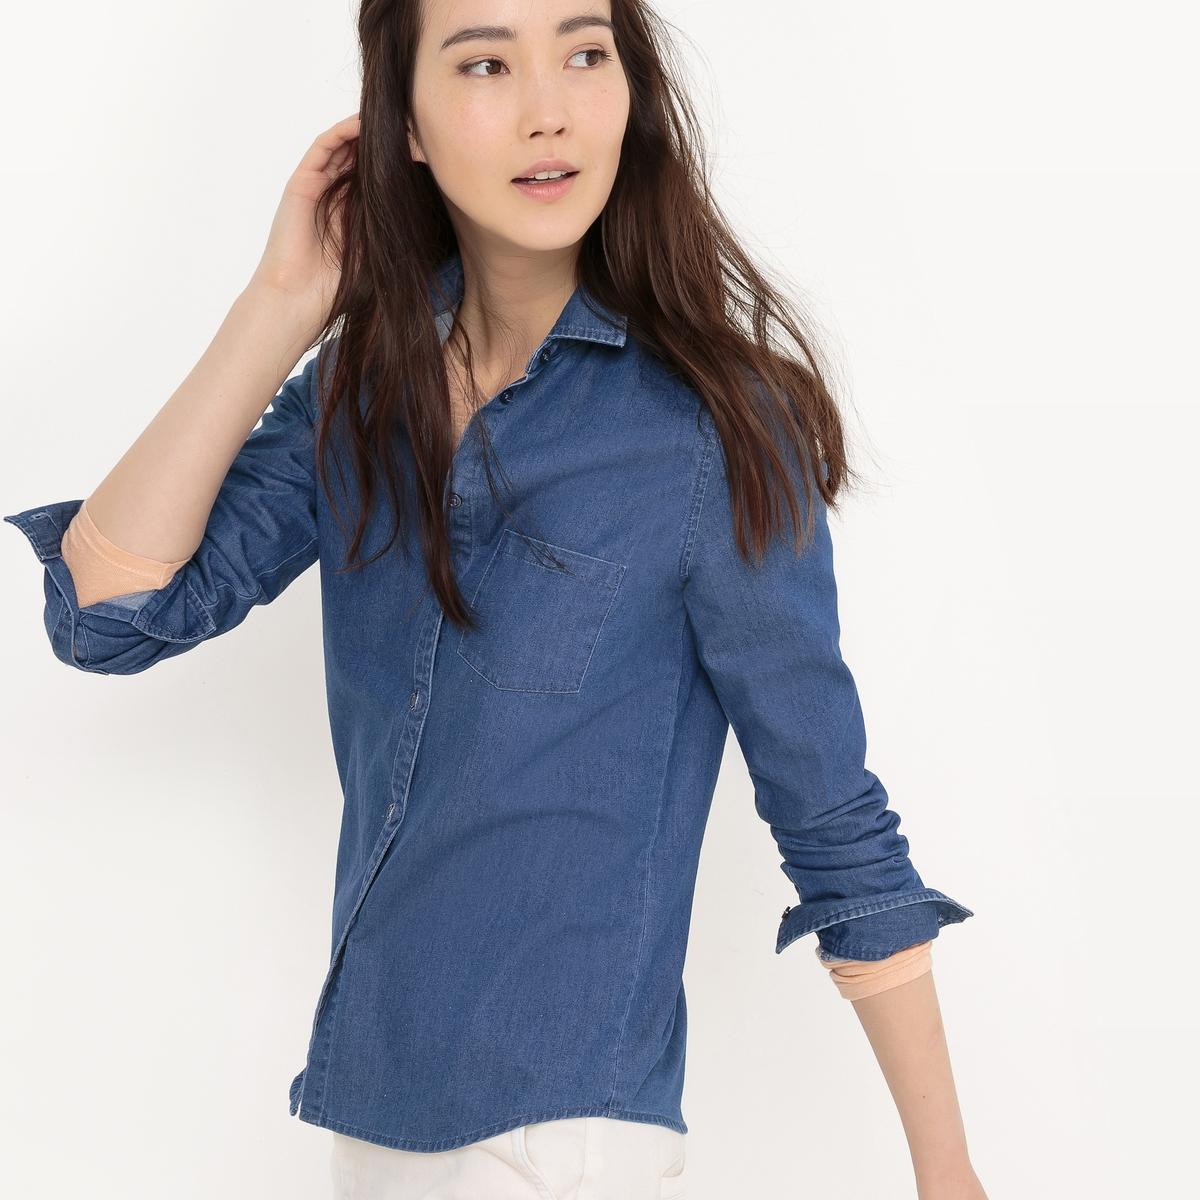 Camisa denim, con corte recto